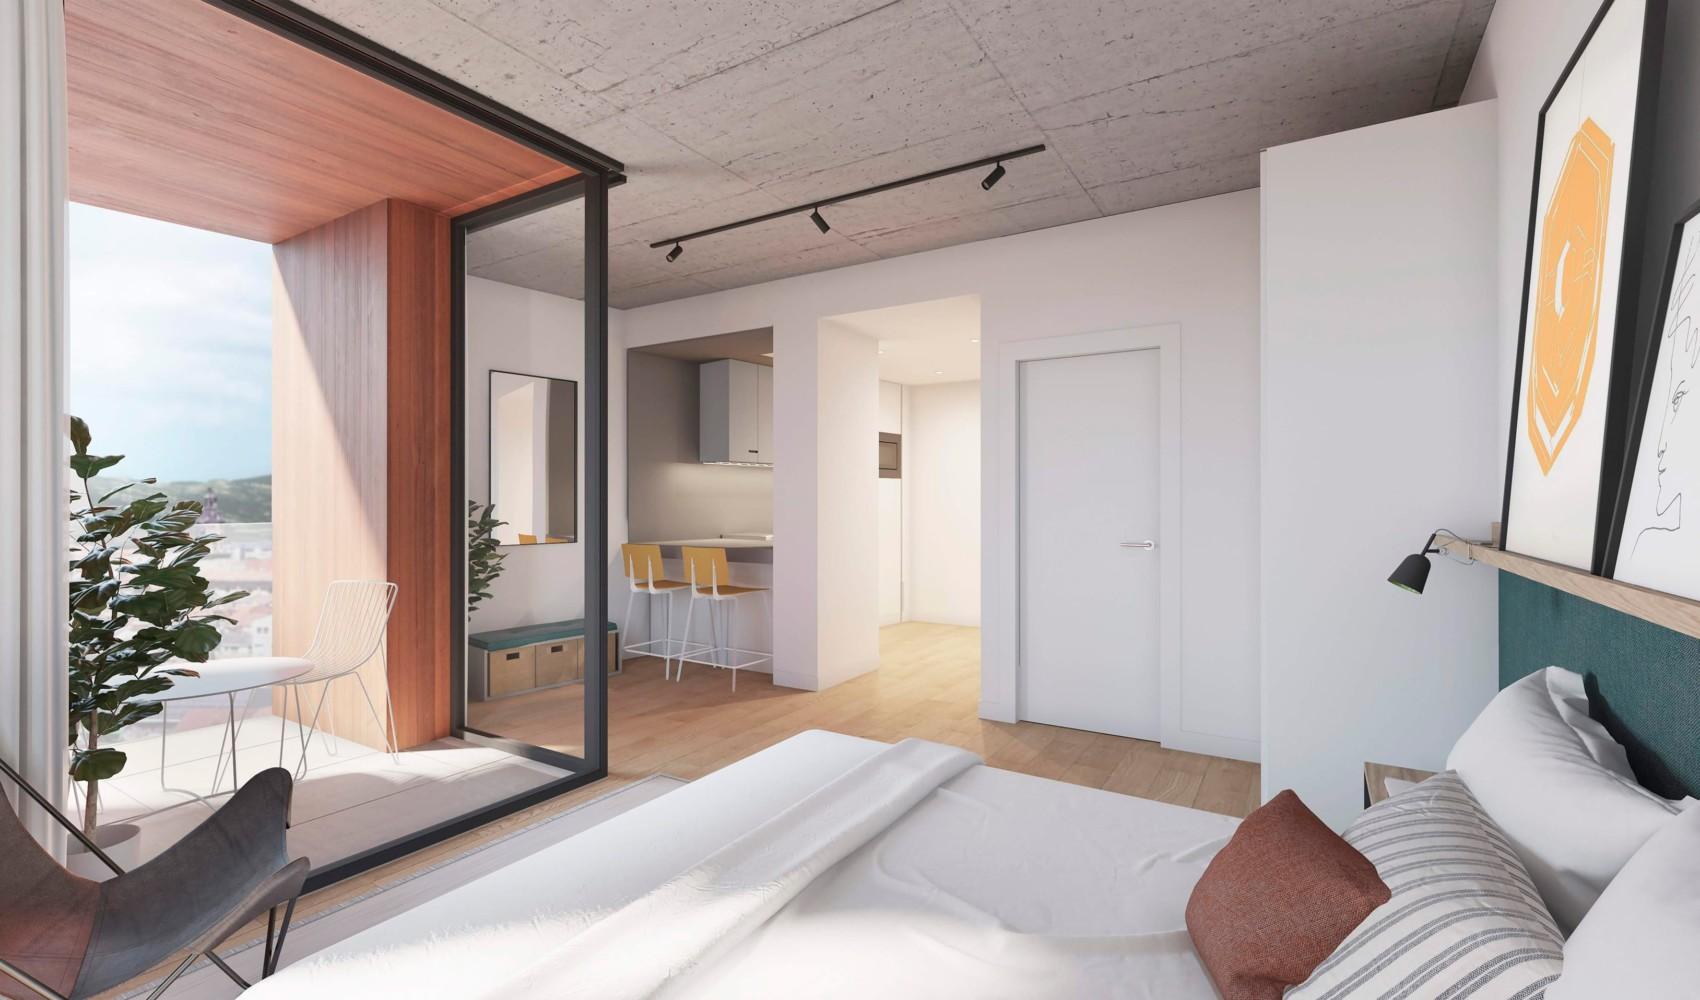 Co-living Coliving Terrace Loft Apartament Vitoria Vitoria-Gasteiz